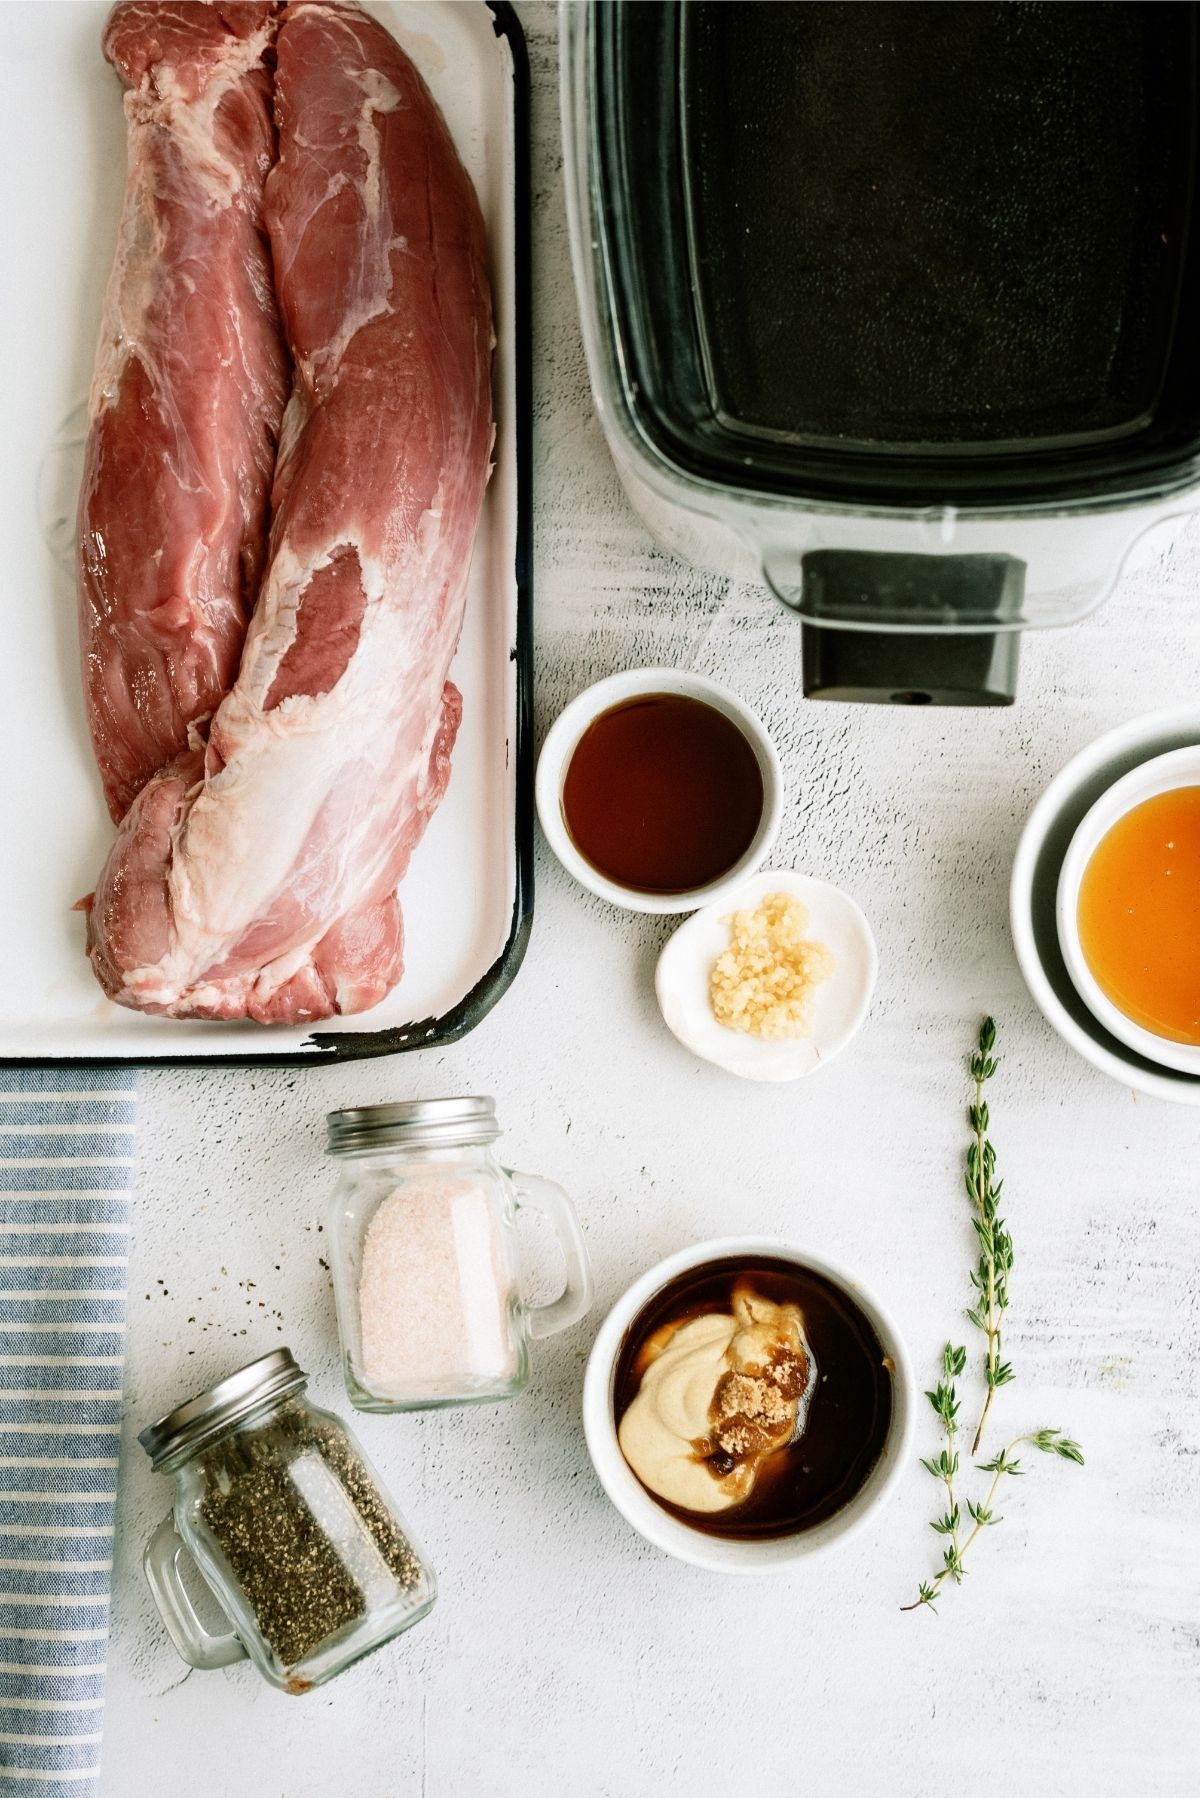 Ingredients for Slow Cooker Maple and Brown Sugar Pork Tenderloin